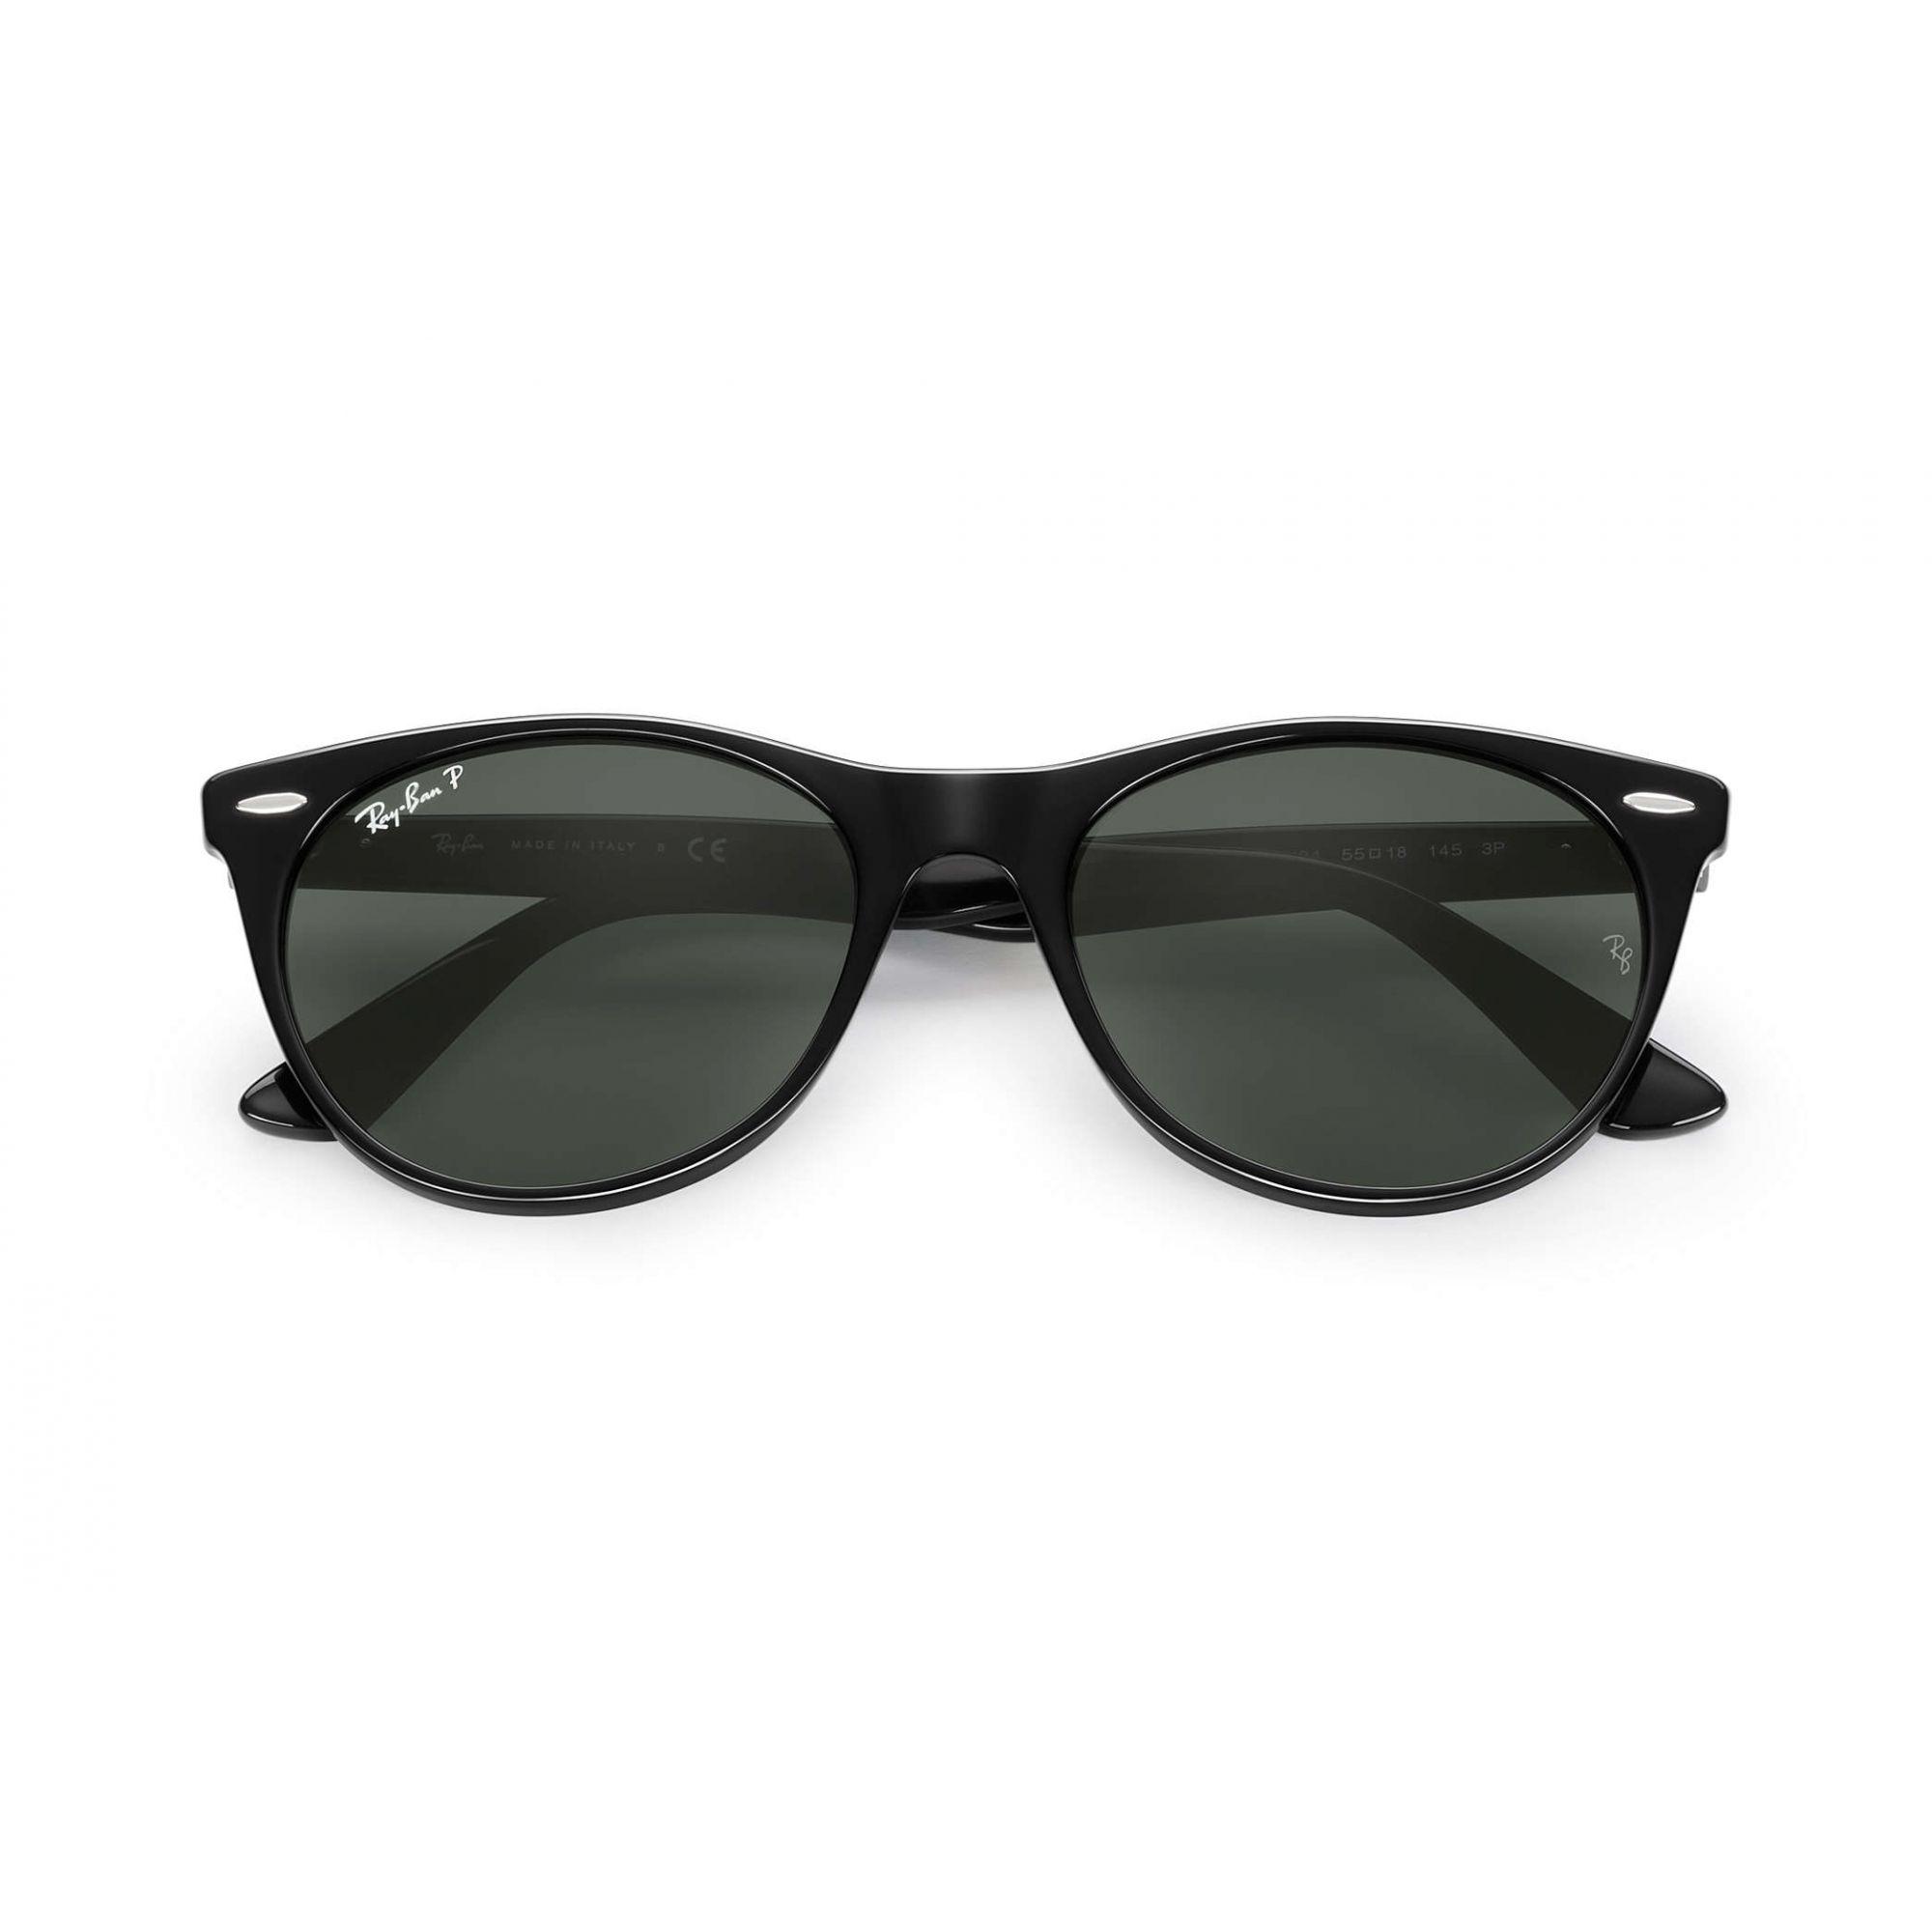 b23937e68 Óculos de Sol Ray-Ban RB2185 901/58 - Omega Ótica e Relojoaria